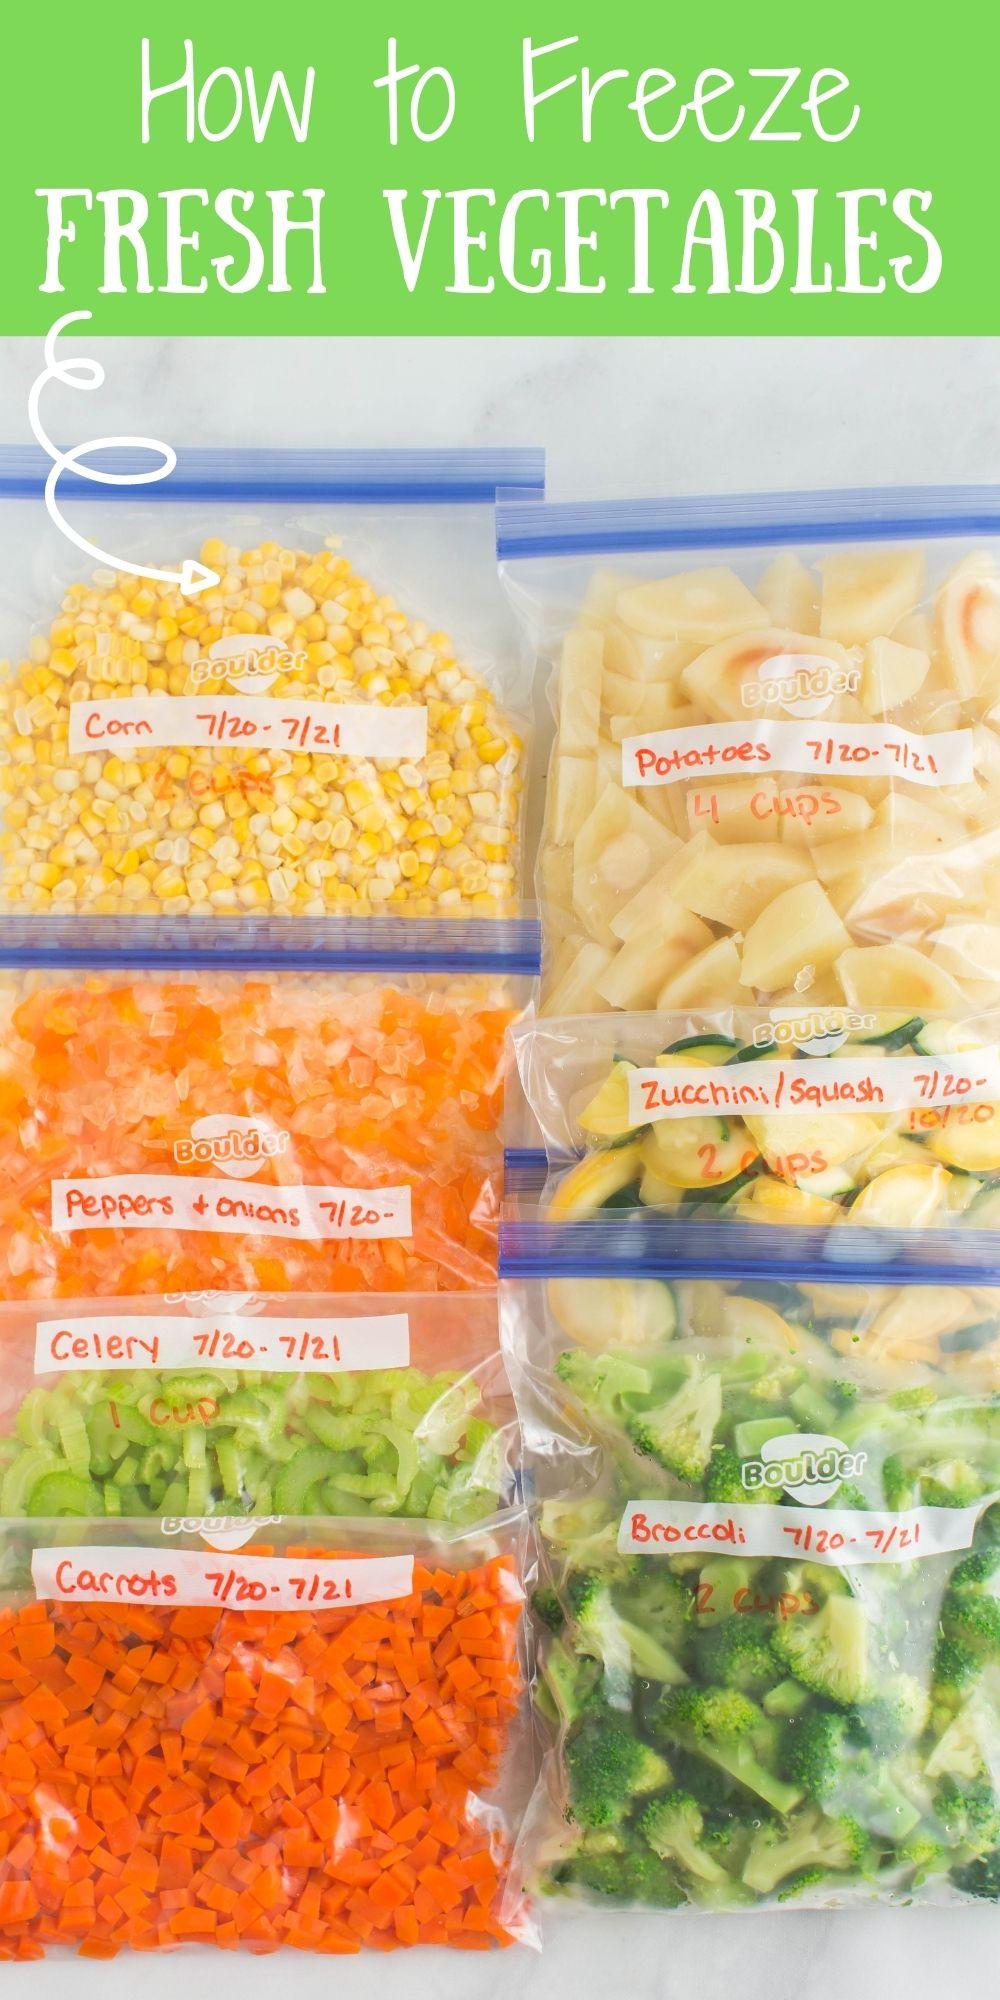 Let's start with the basics 6 steps of how to Freeze Fresh Vegetables. Potatoes, corns, carrots, celery, broccoli & more. via @familyfresh